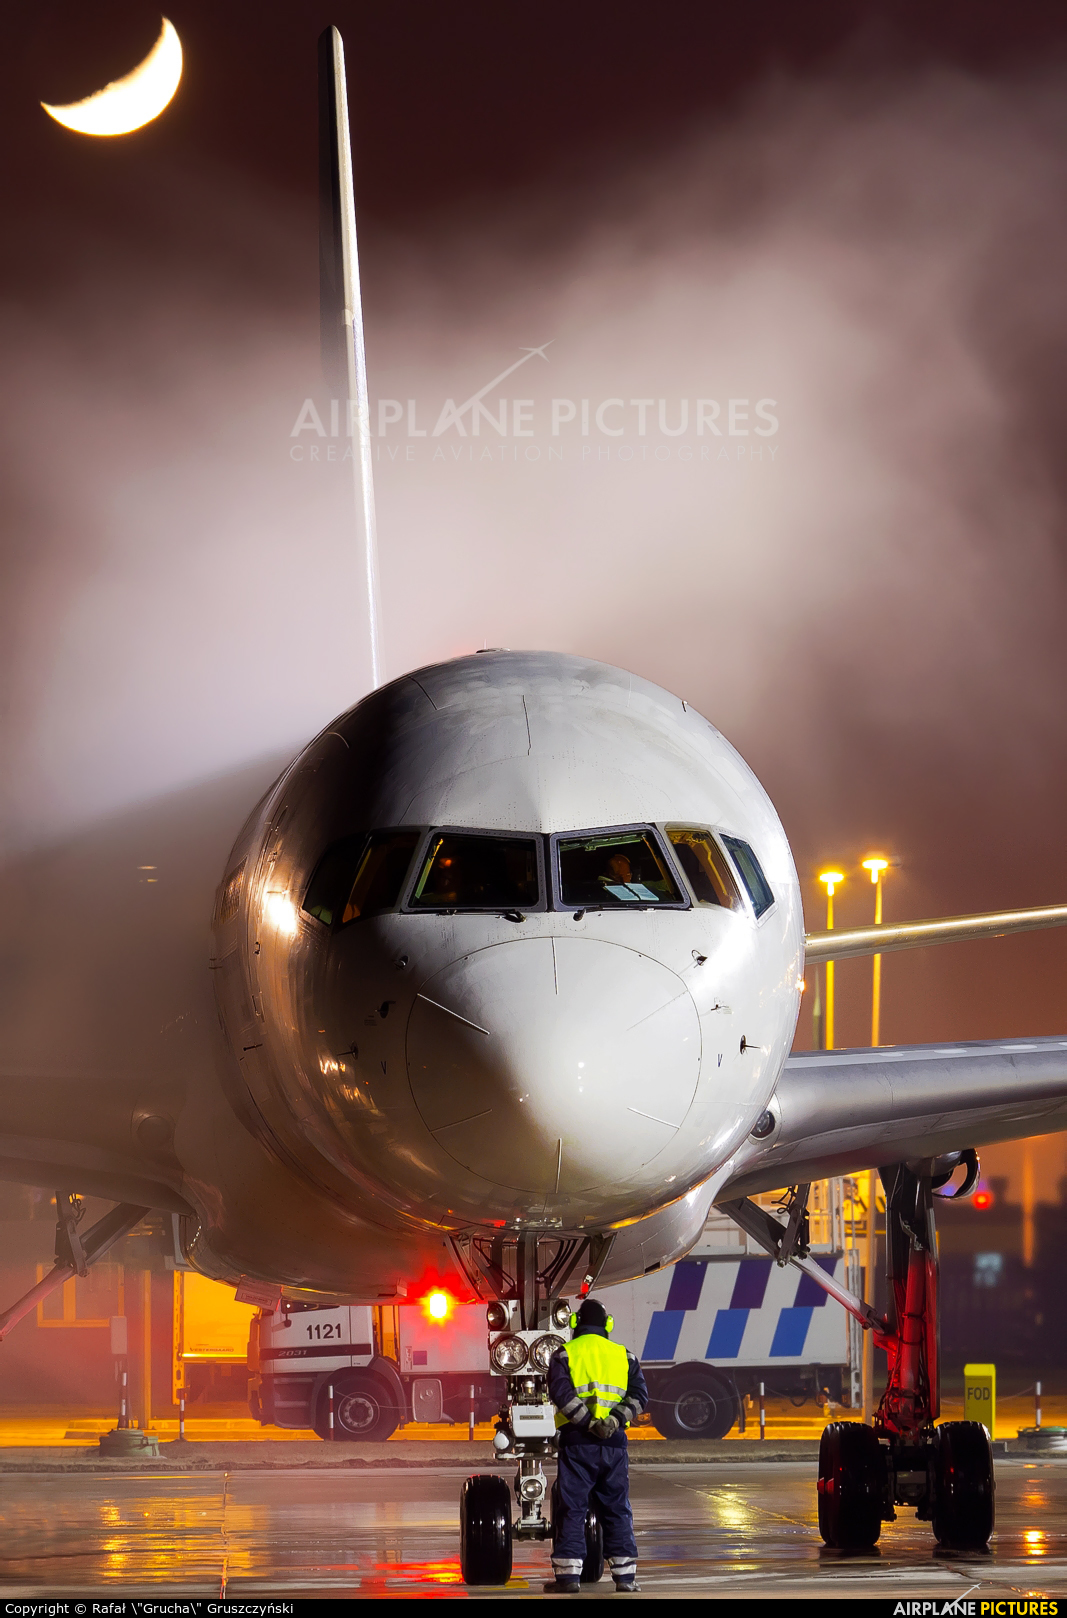 El Al Israel Airlines 4X-EBV aircraft at Warsaw - Frederic Chopin